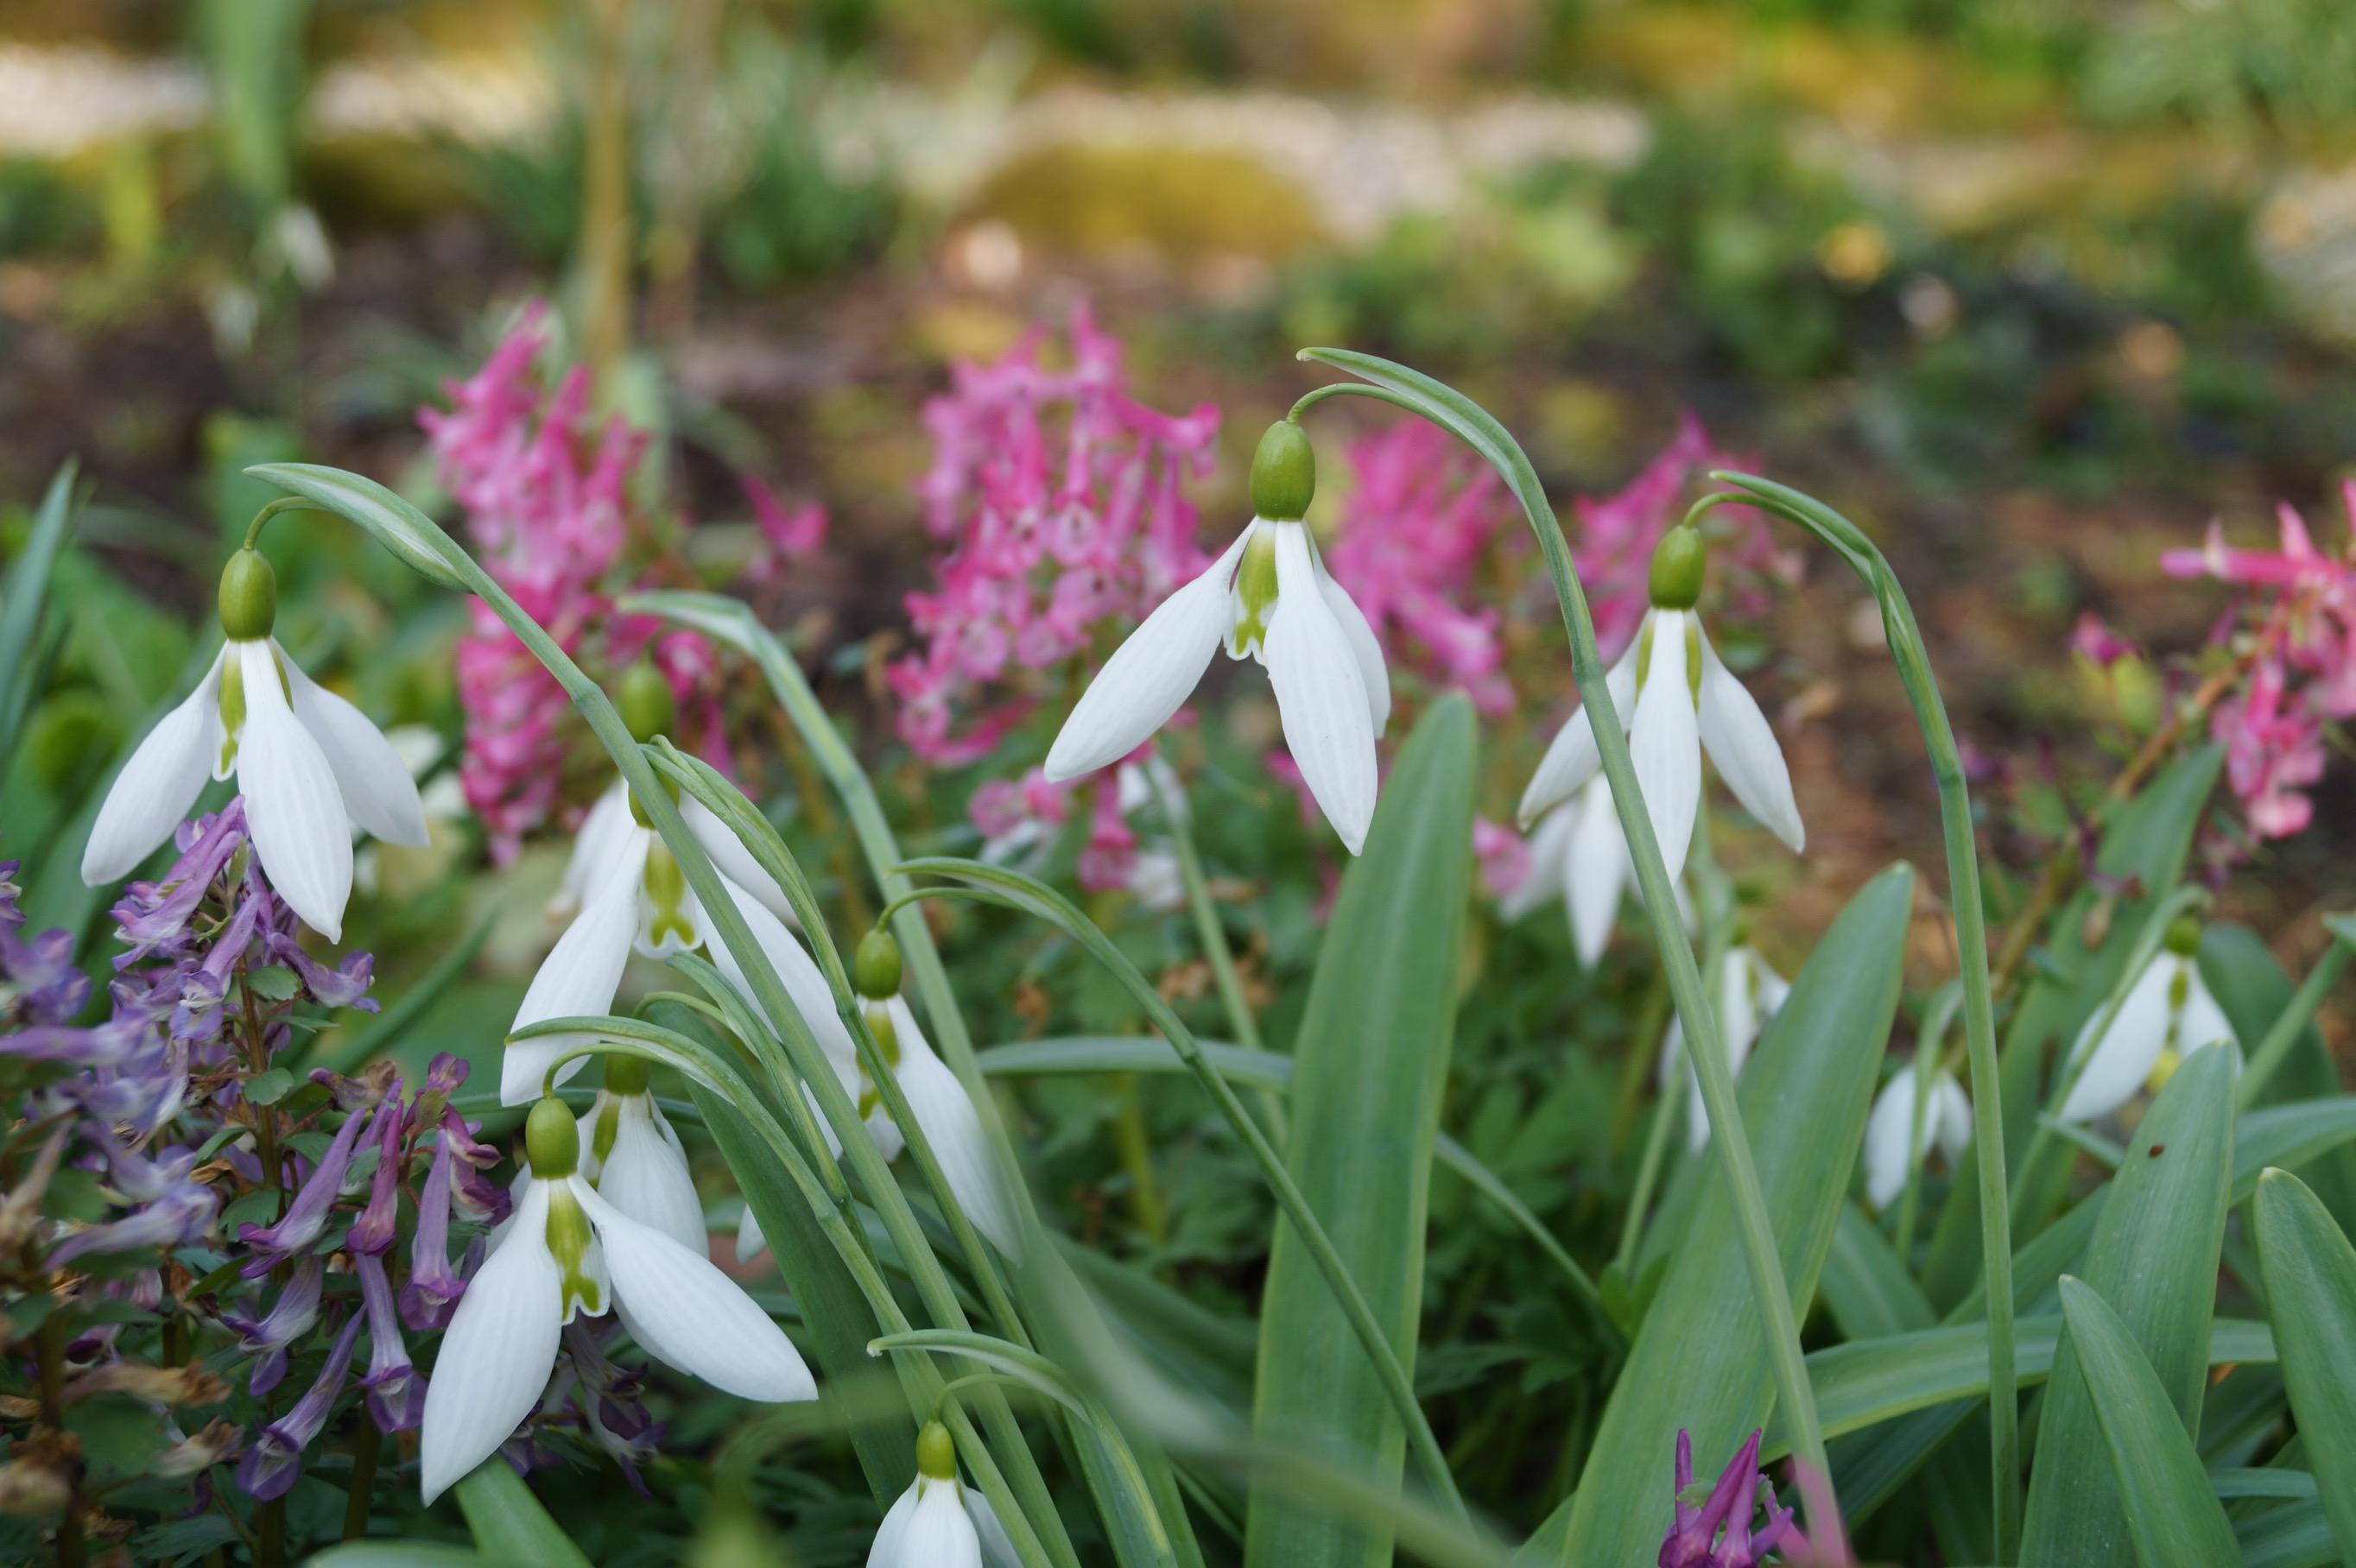 galanthus_plicatus _beth_chatto_morlas_plants